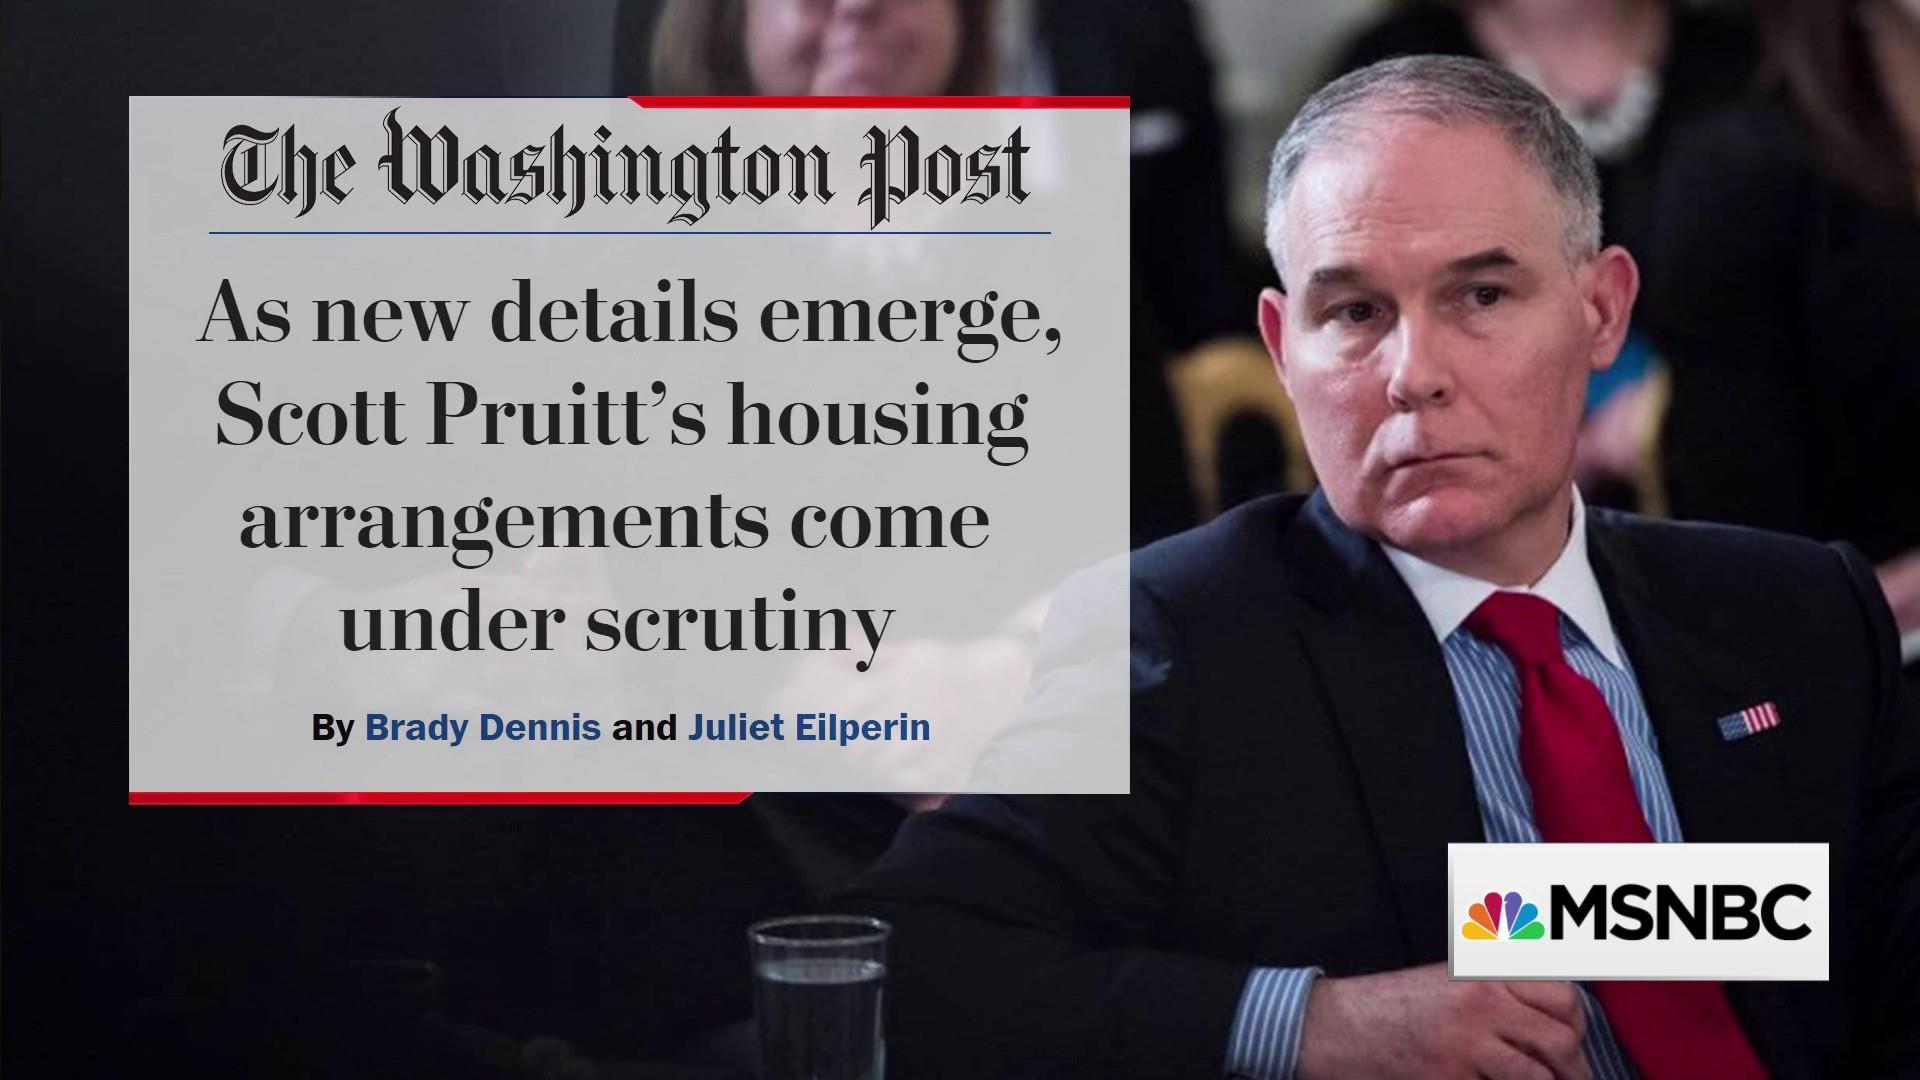 Trump's EPA head Scott Pruitt faces new housing scandal